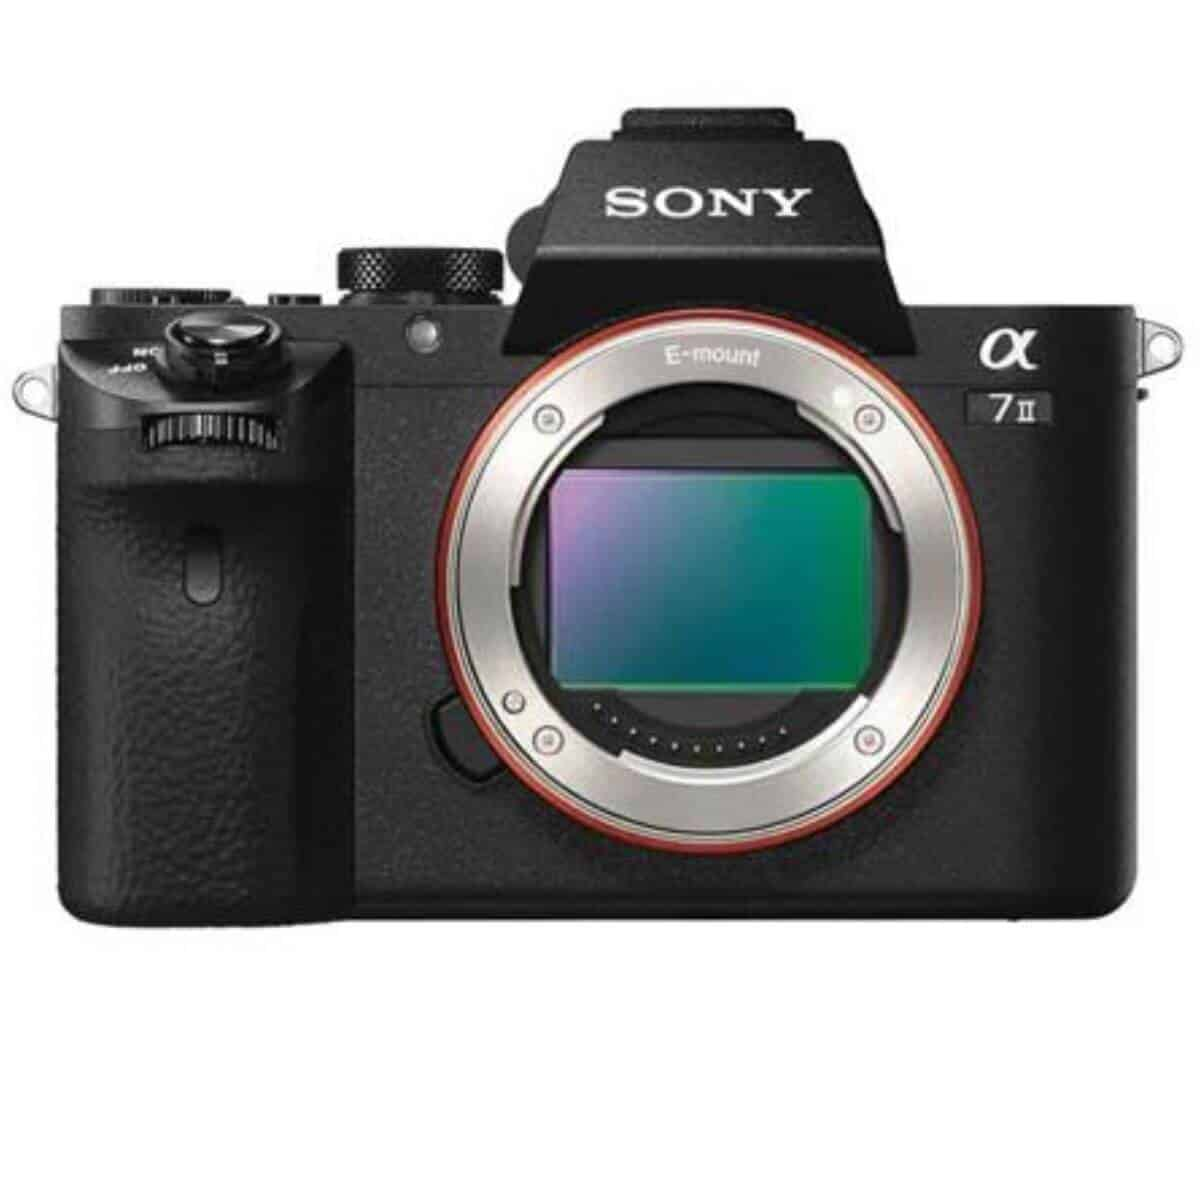 Sony a7 II camera.